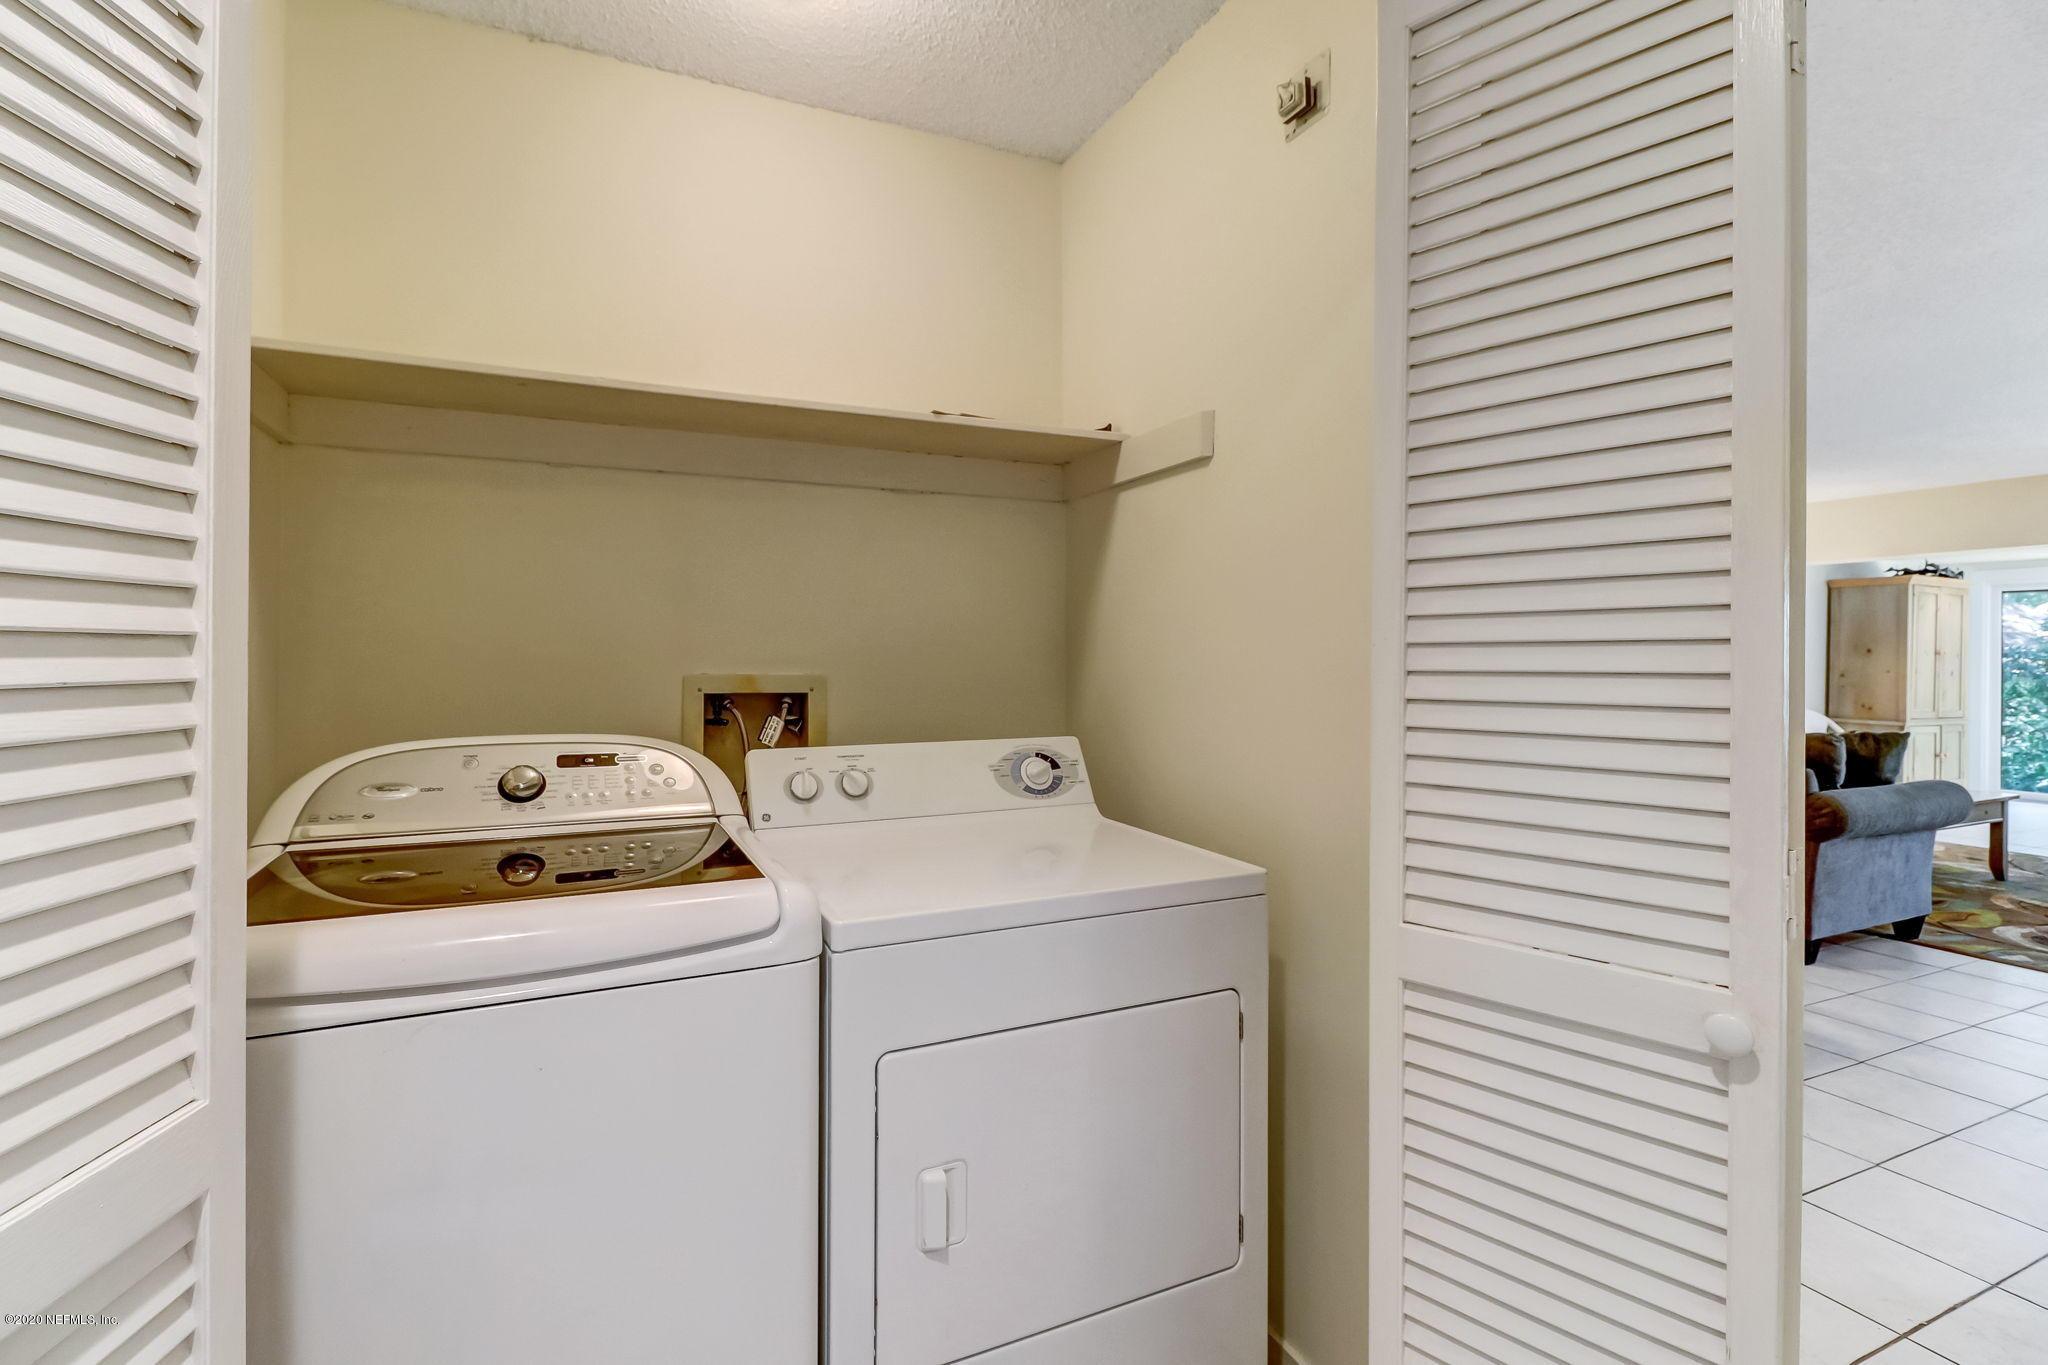 3317 SEA MARSH, FERNANDINA BEACH, FLORIDA 32034, 2 Bedrooms Bedrooms, ,2 BathroomsBathrooms,Residential,For sale,SEA MARSH,1064787